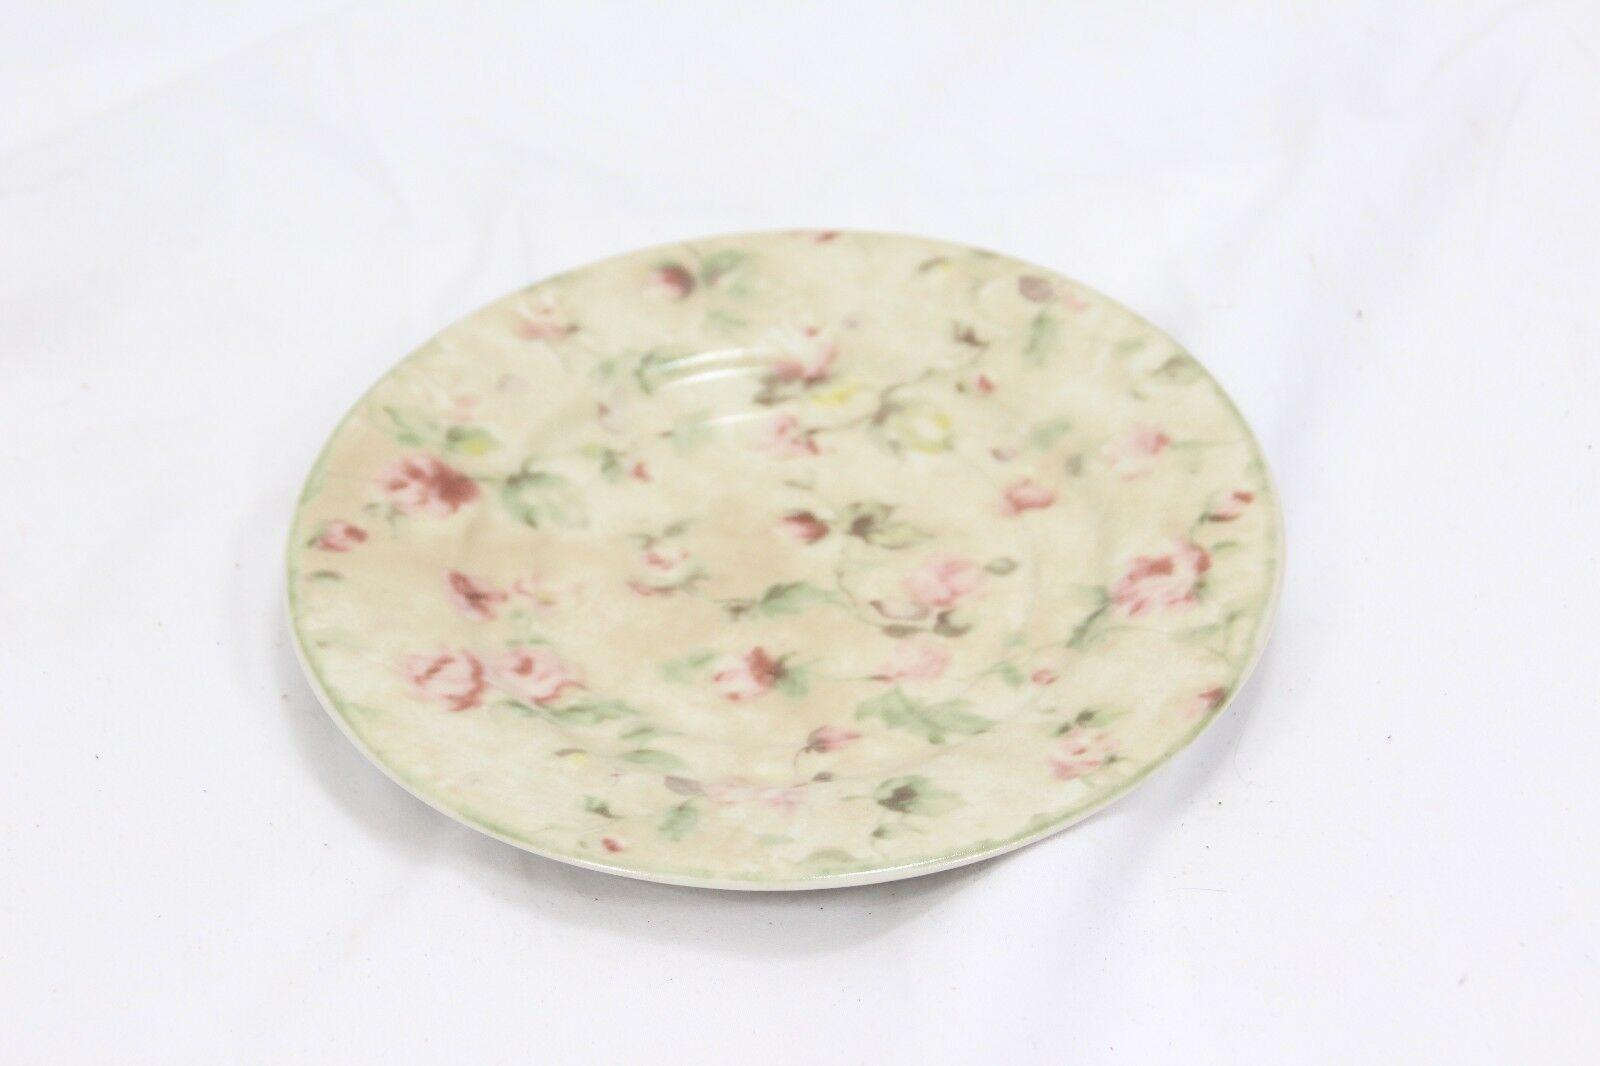 "222 Fifth Savannah Plates Saucers 6.5"" Set of 8 image 5"